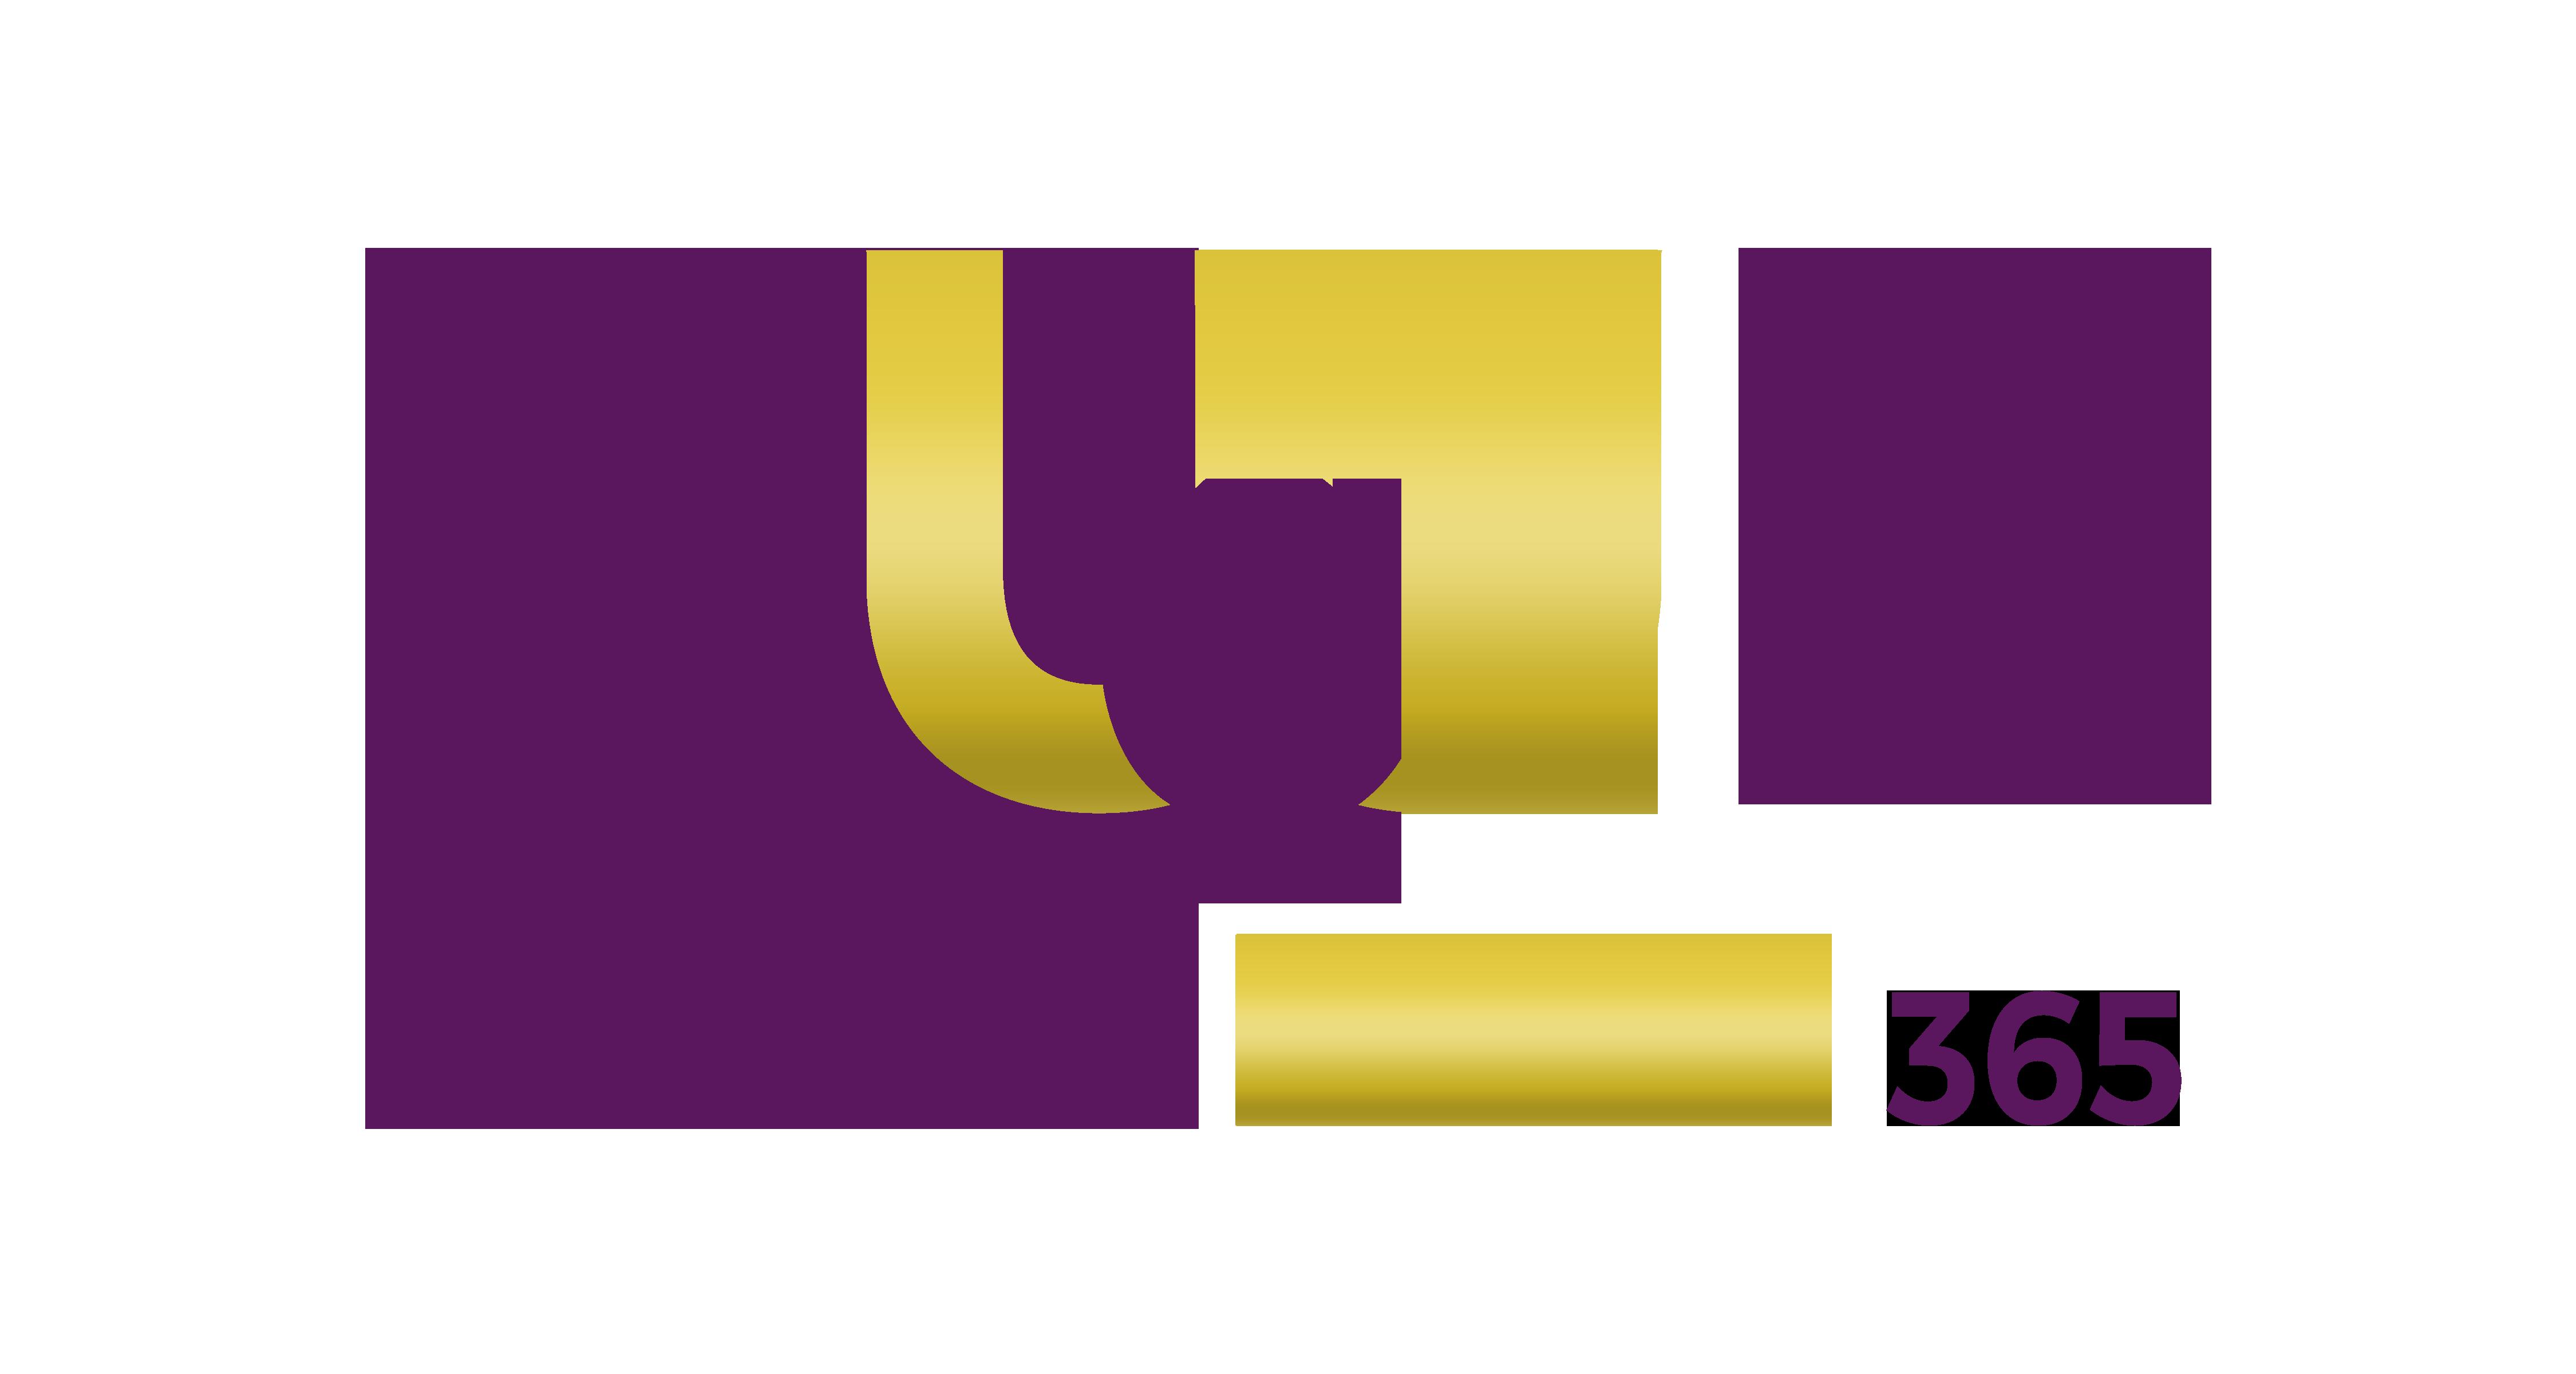 RWR Live 365